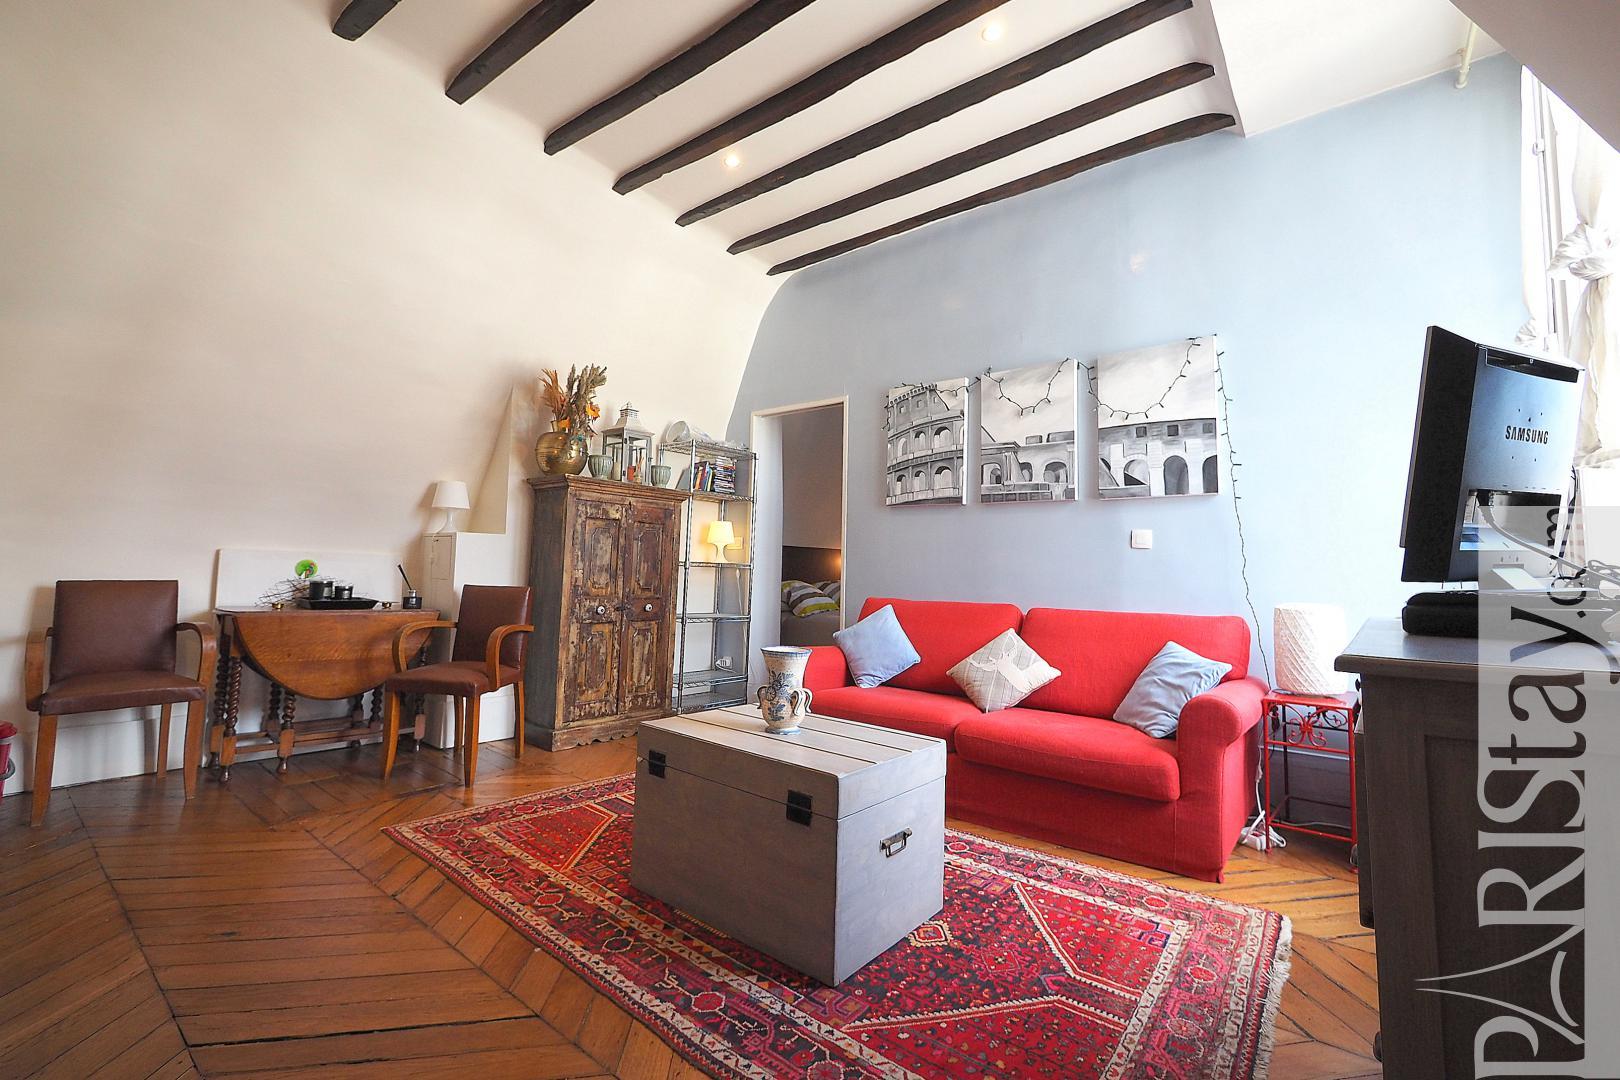 paris apartment for rent one bedroom apartment rental. Black Bedroom Furniture Sets. Home Design Ideas